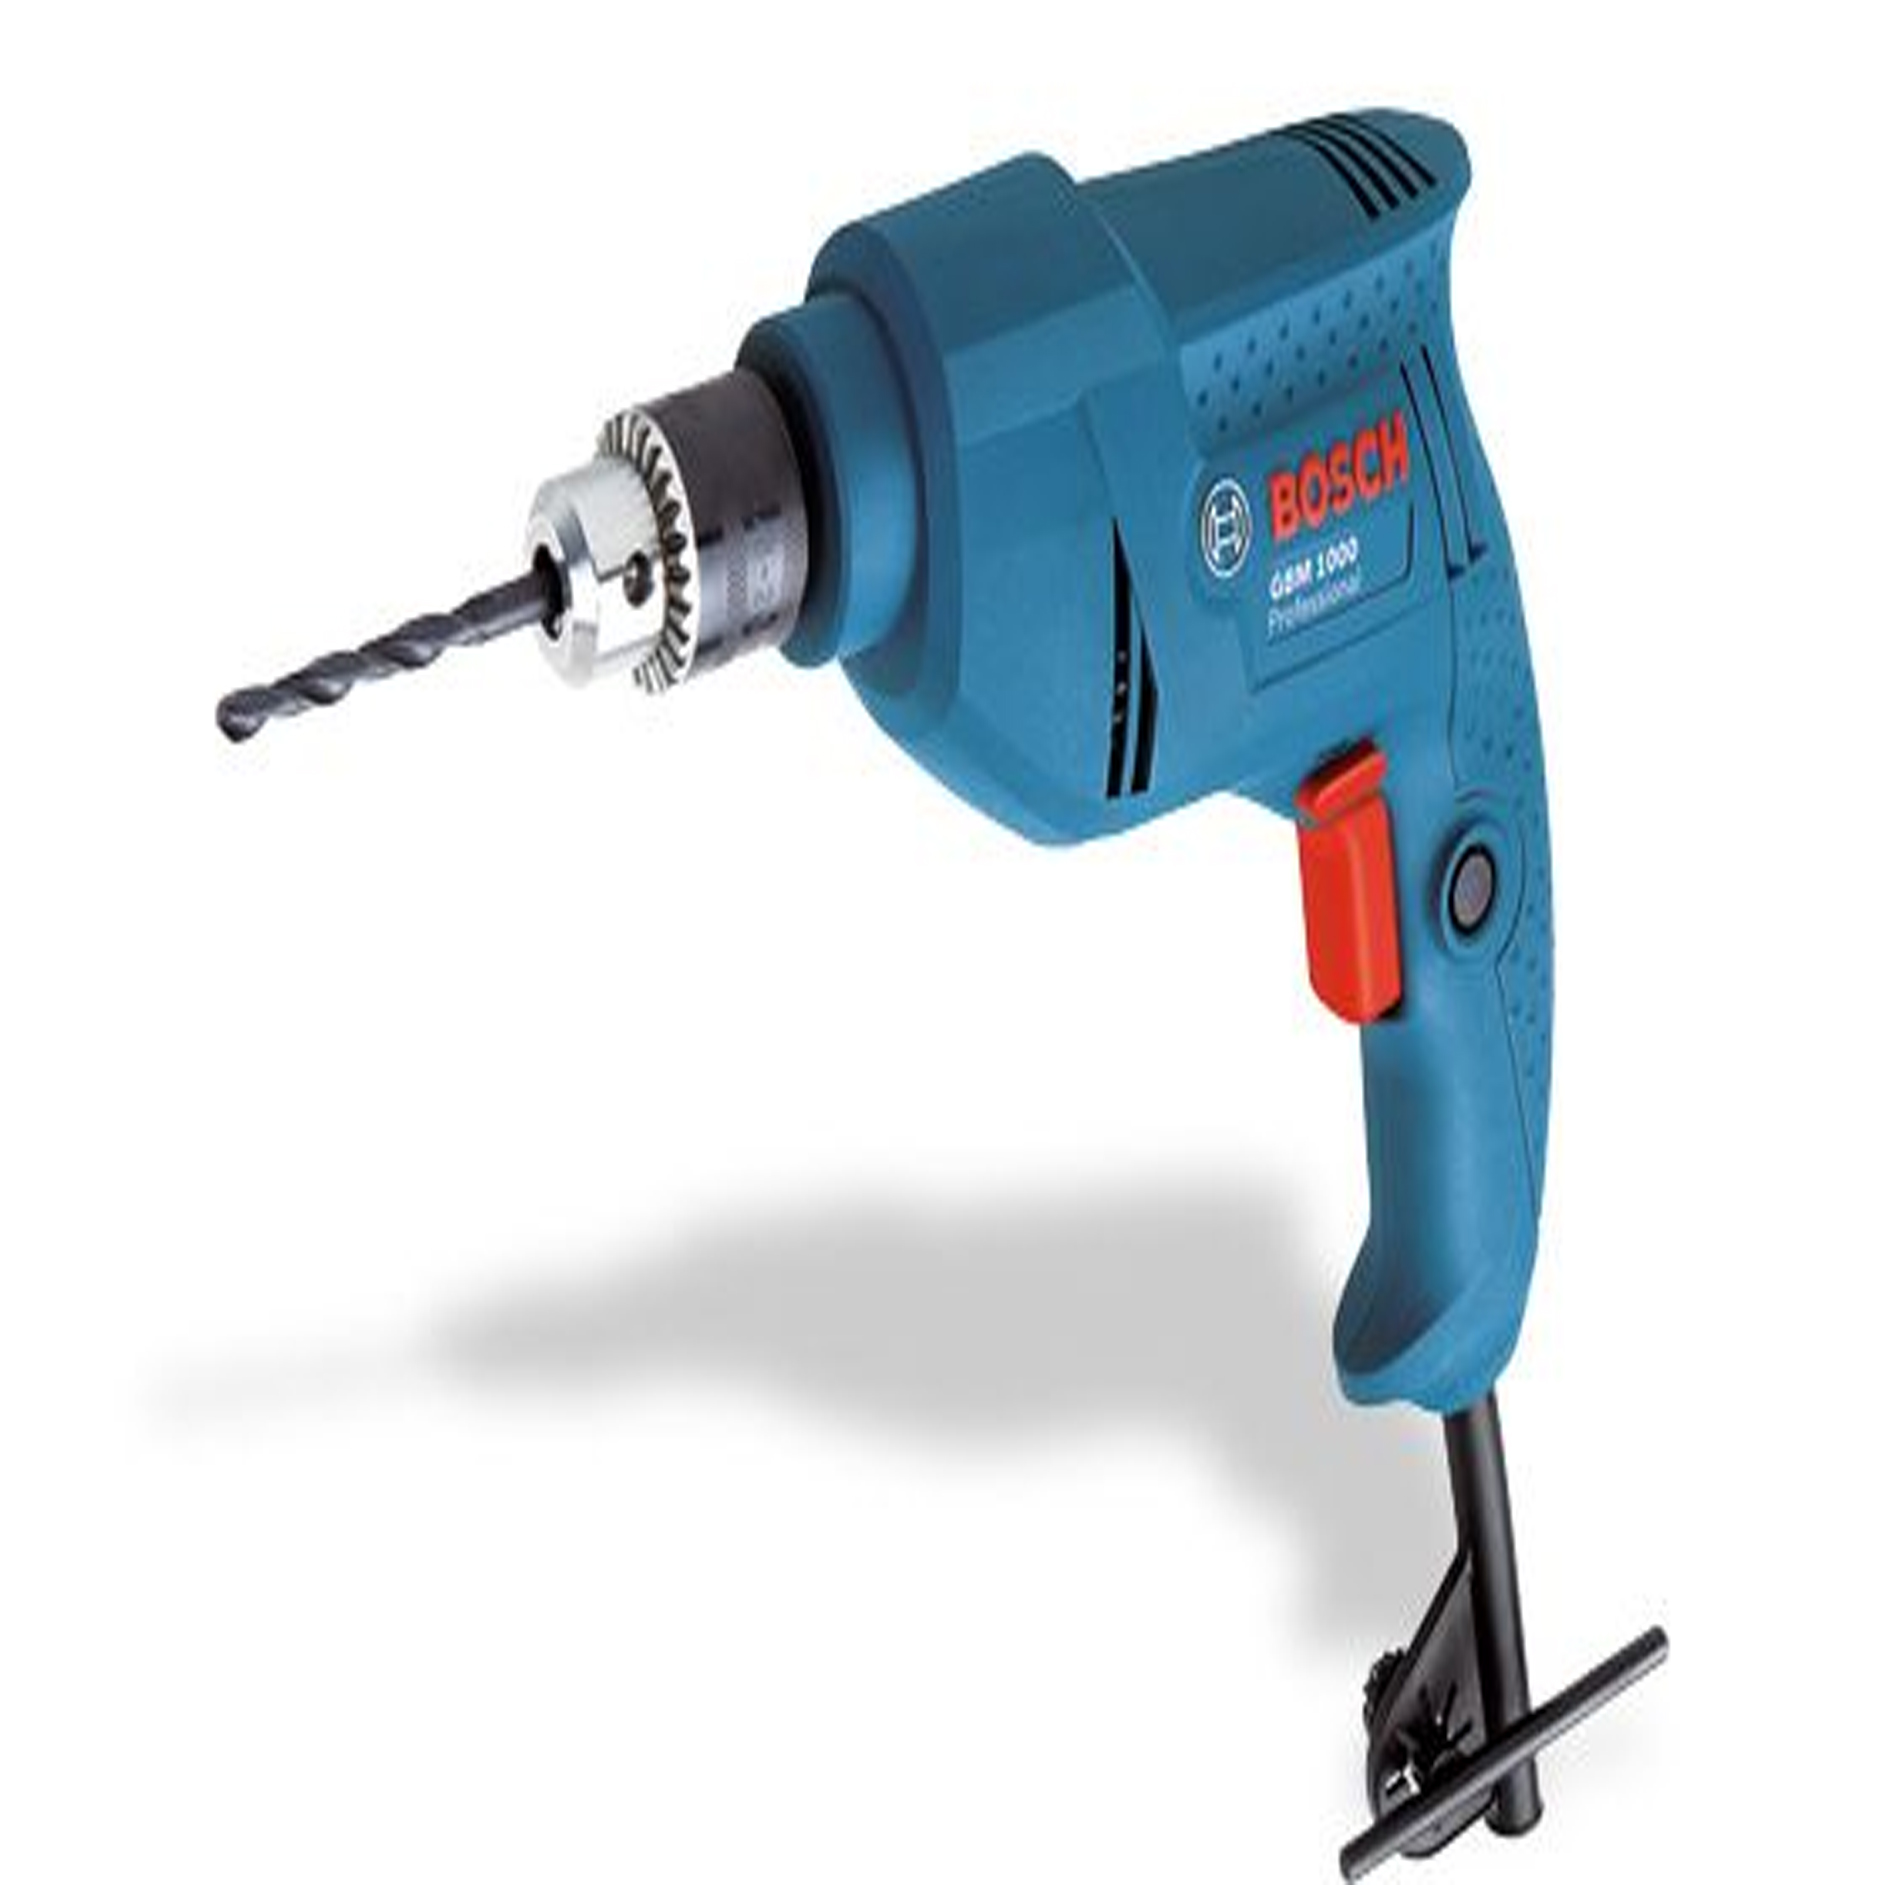 Bosch GBM 1000 Mesin Bor Professional